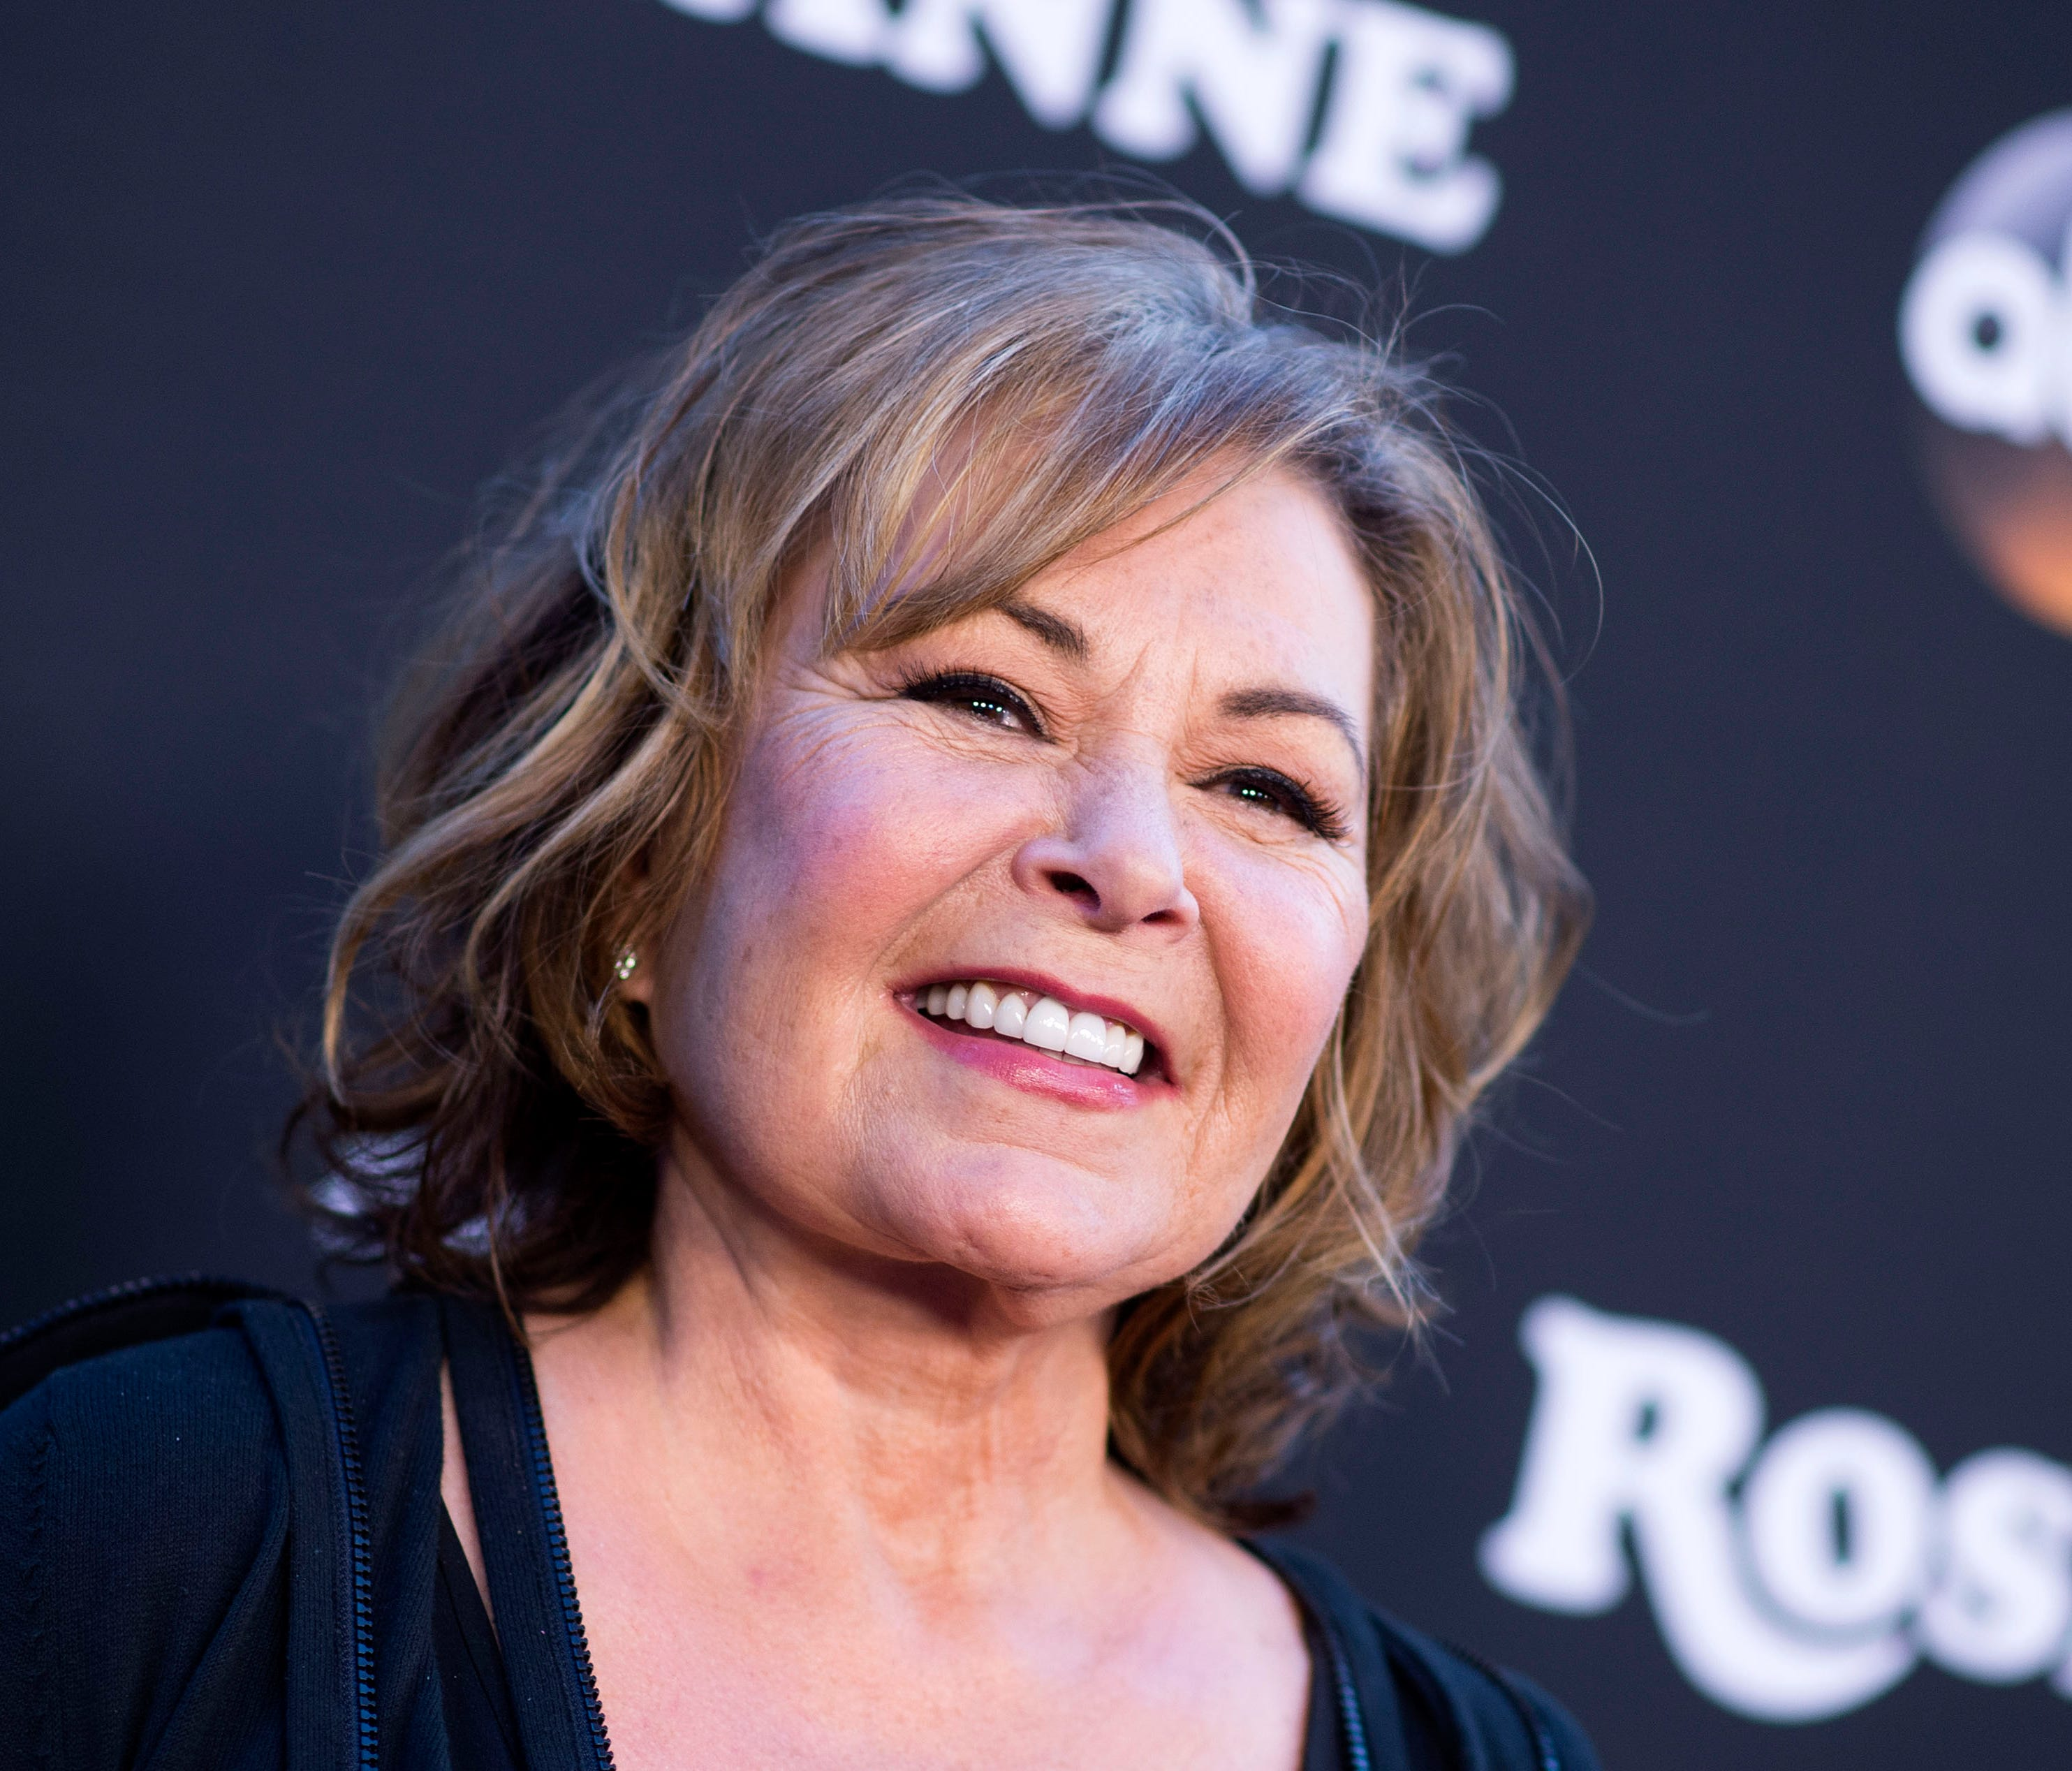 Roseanne Barr's return this week in 'Roseanne' drew a huge TV audience, but not everyone is happy with her return.